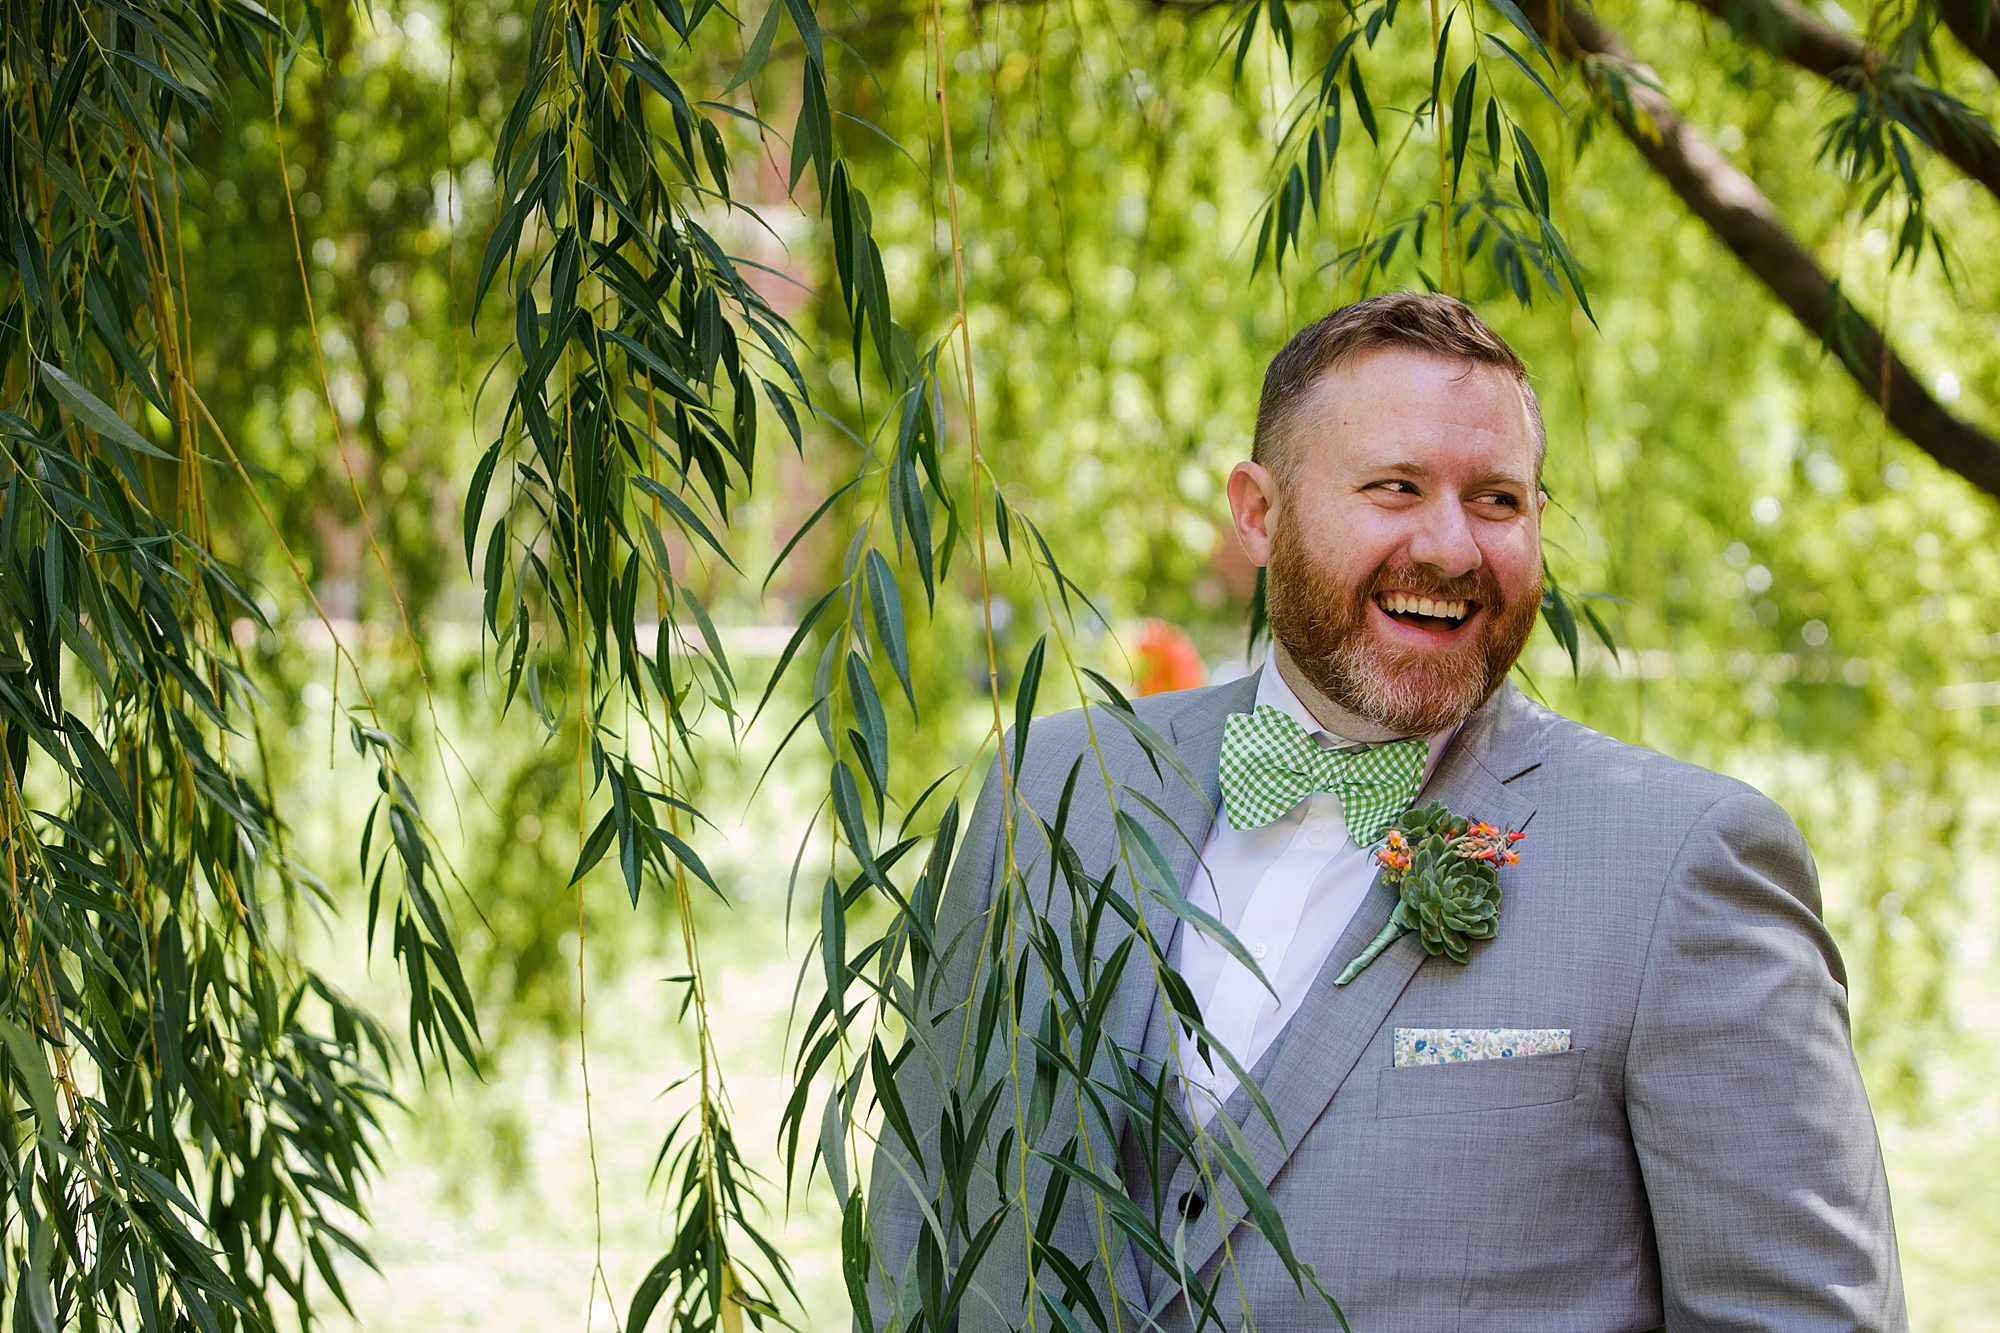 Dan_and_Byron_Love_by_Joe_Mac_Philadelphia_Wedding_LGBTQ_Photography_Gay_Independence_visitor_Center_49.JPG